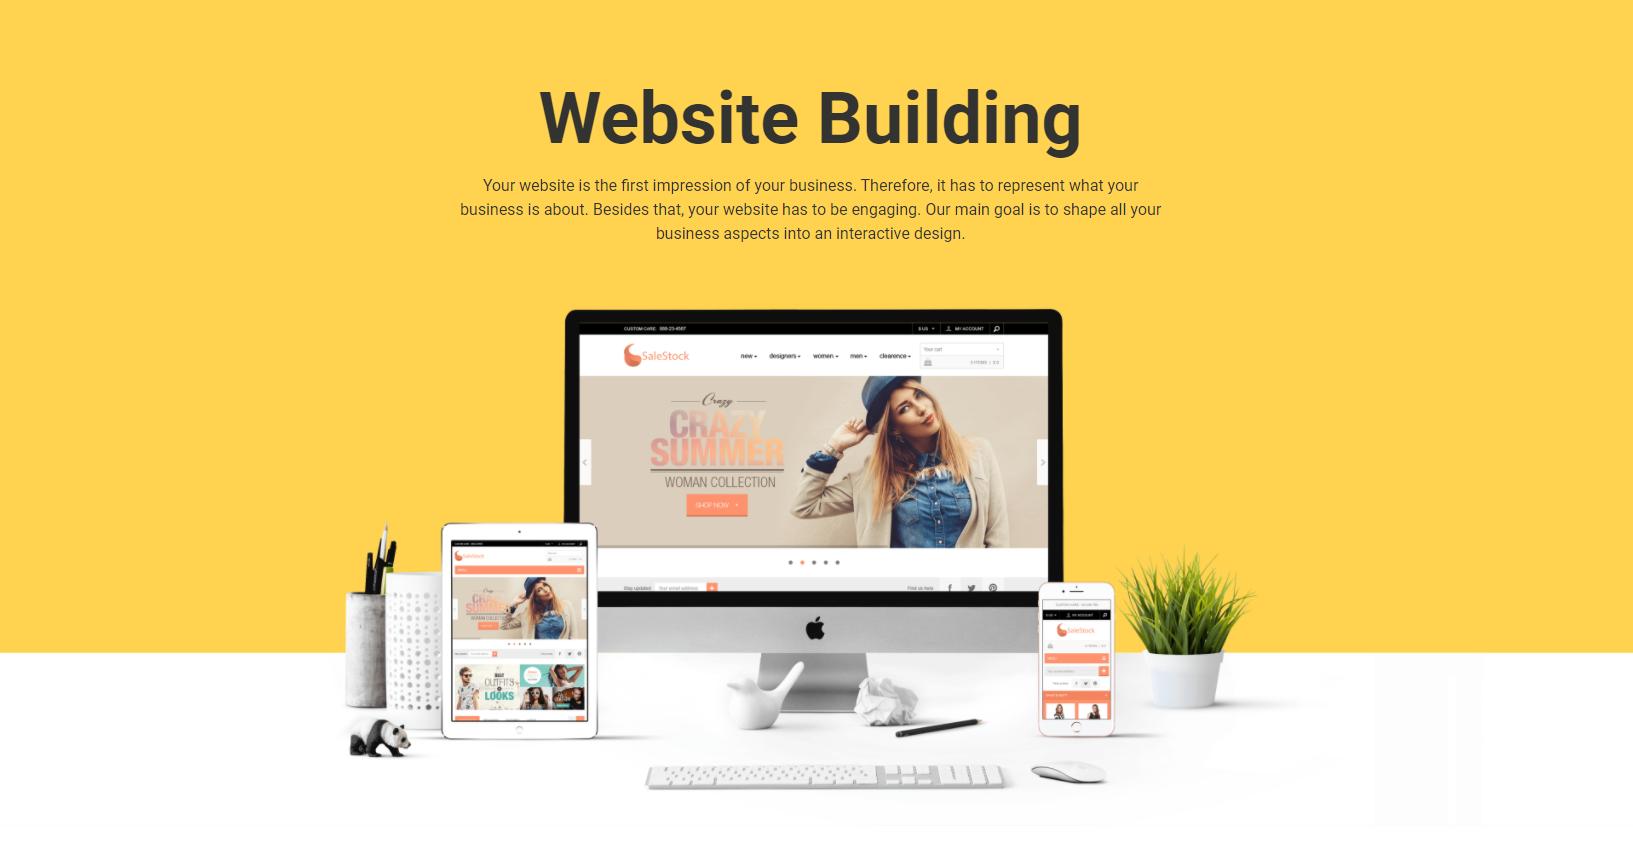 Website Building Image'